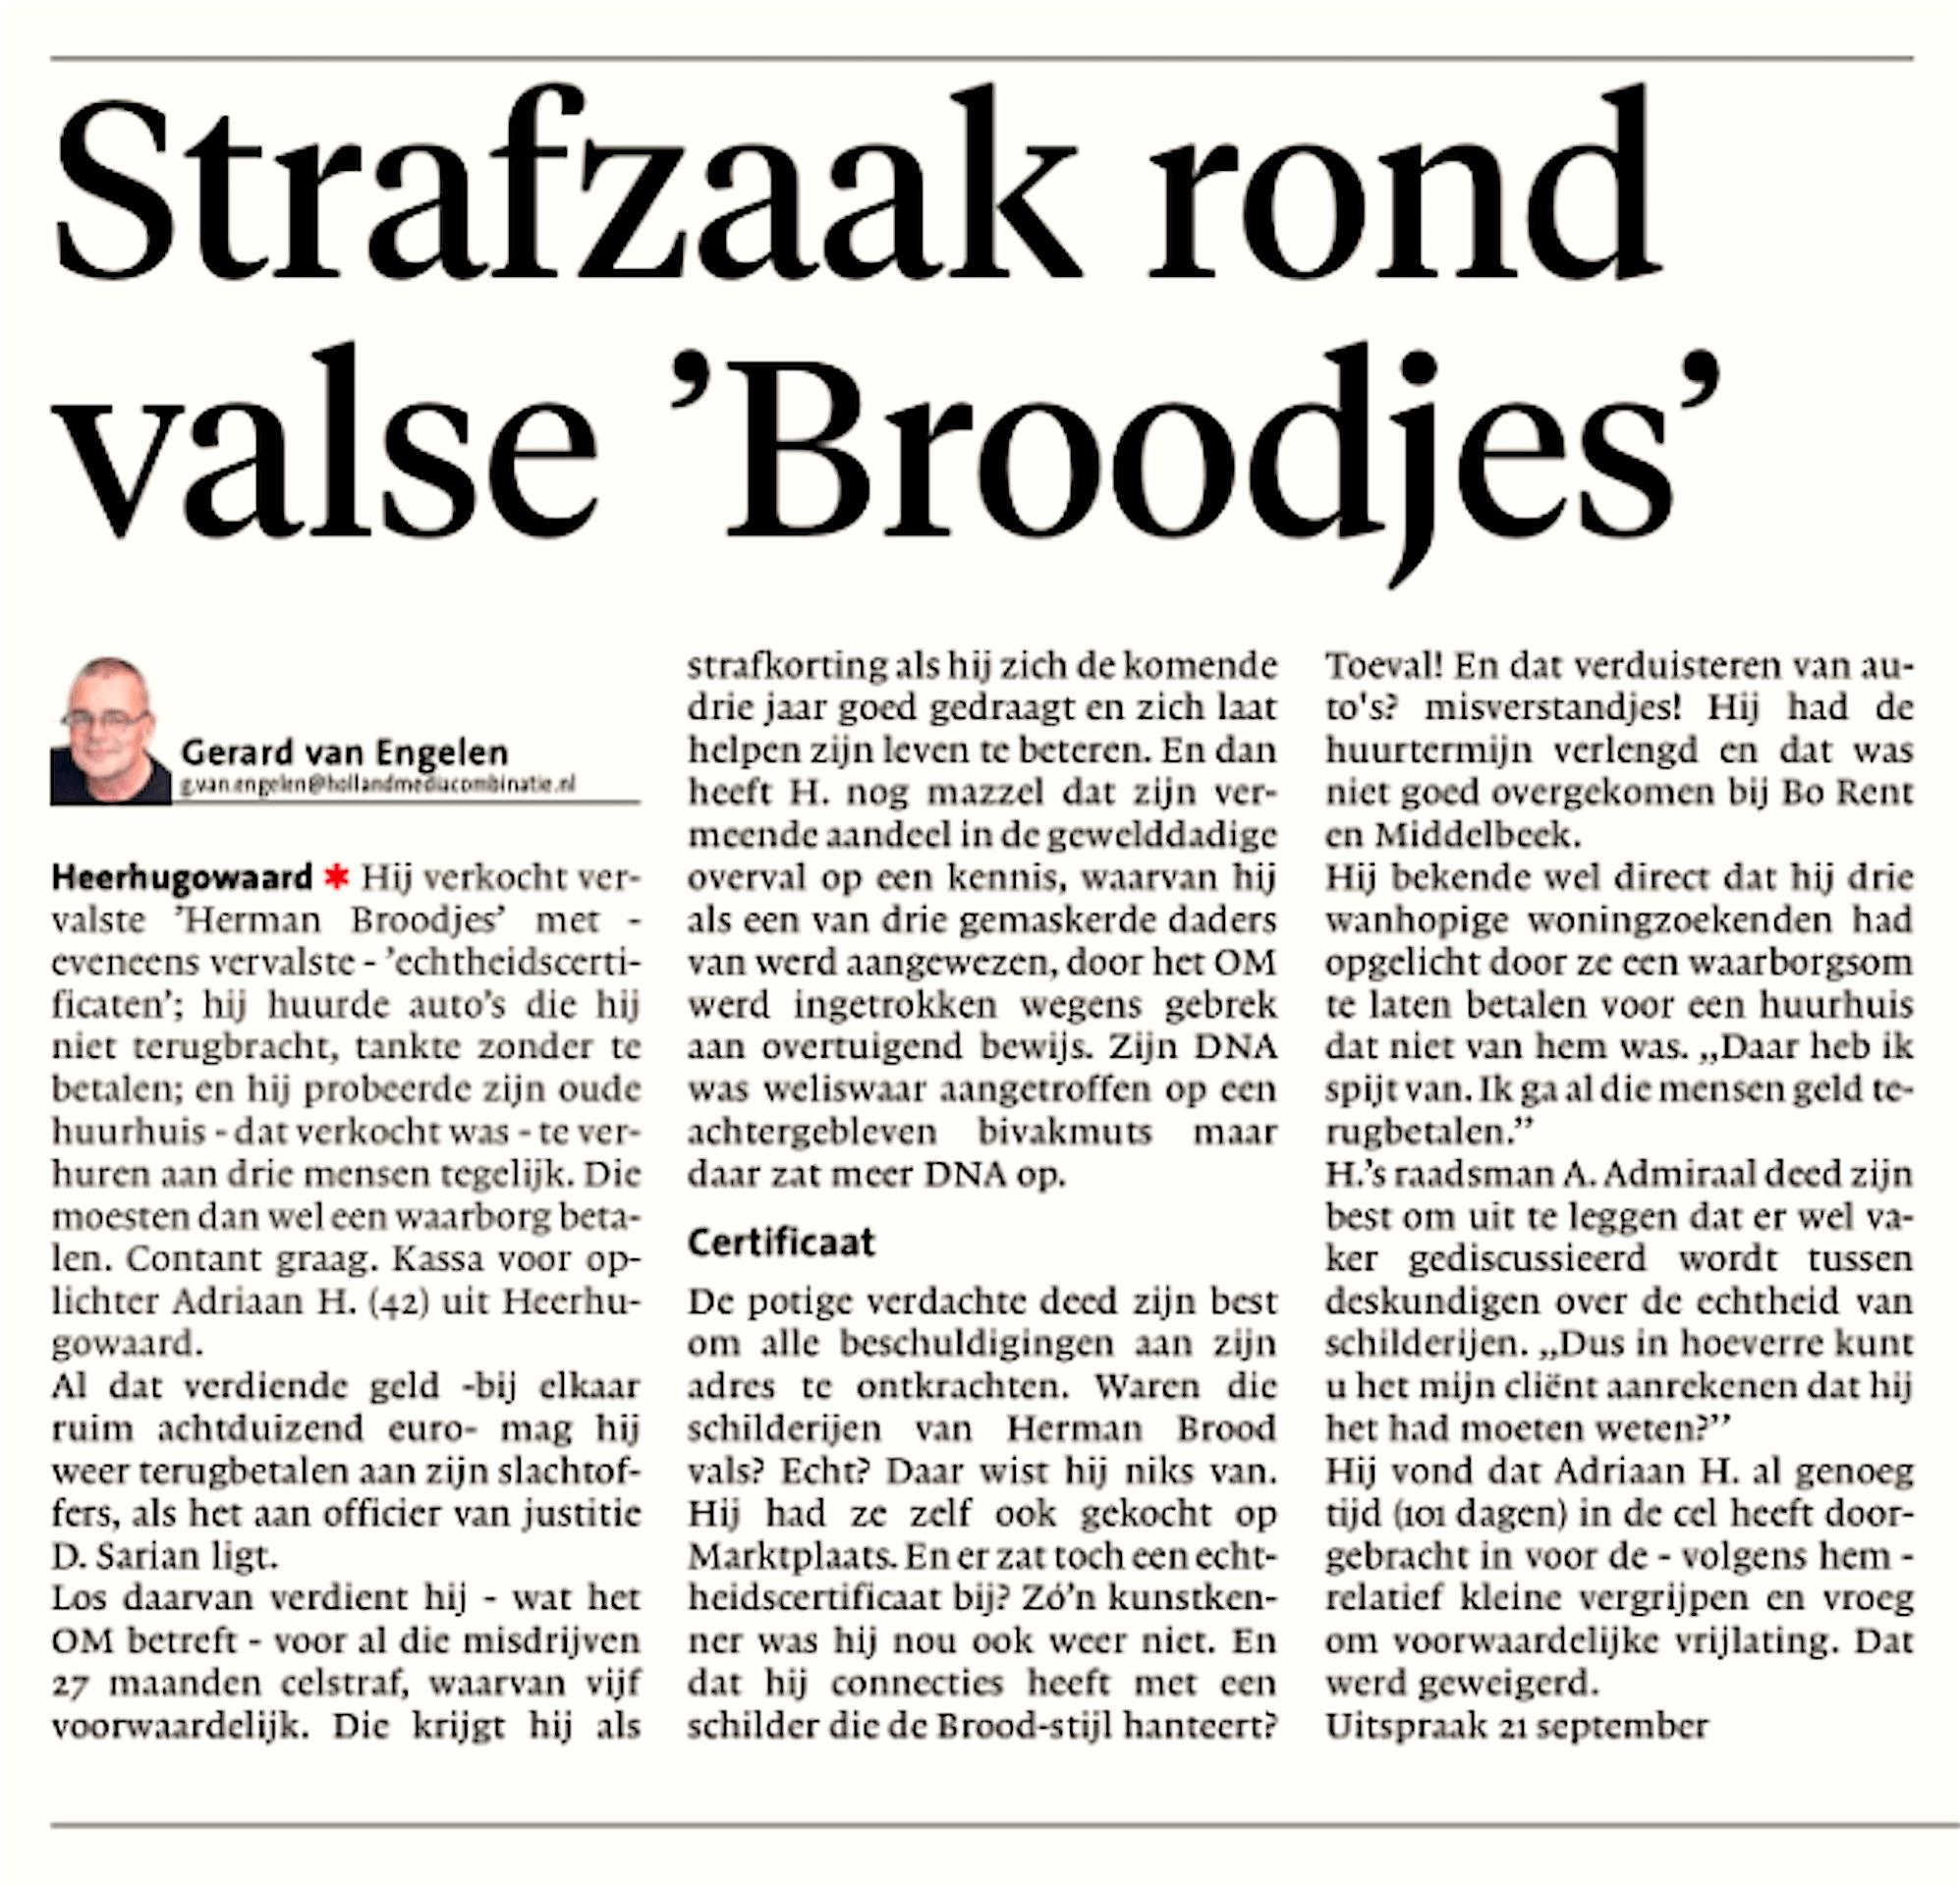 Gerard van Engelen - Strafzaak rond valse 'Broodjes', Alkmaarse Courant, 9 september 2018